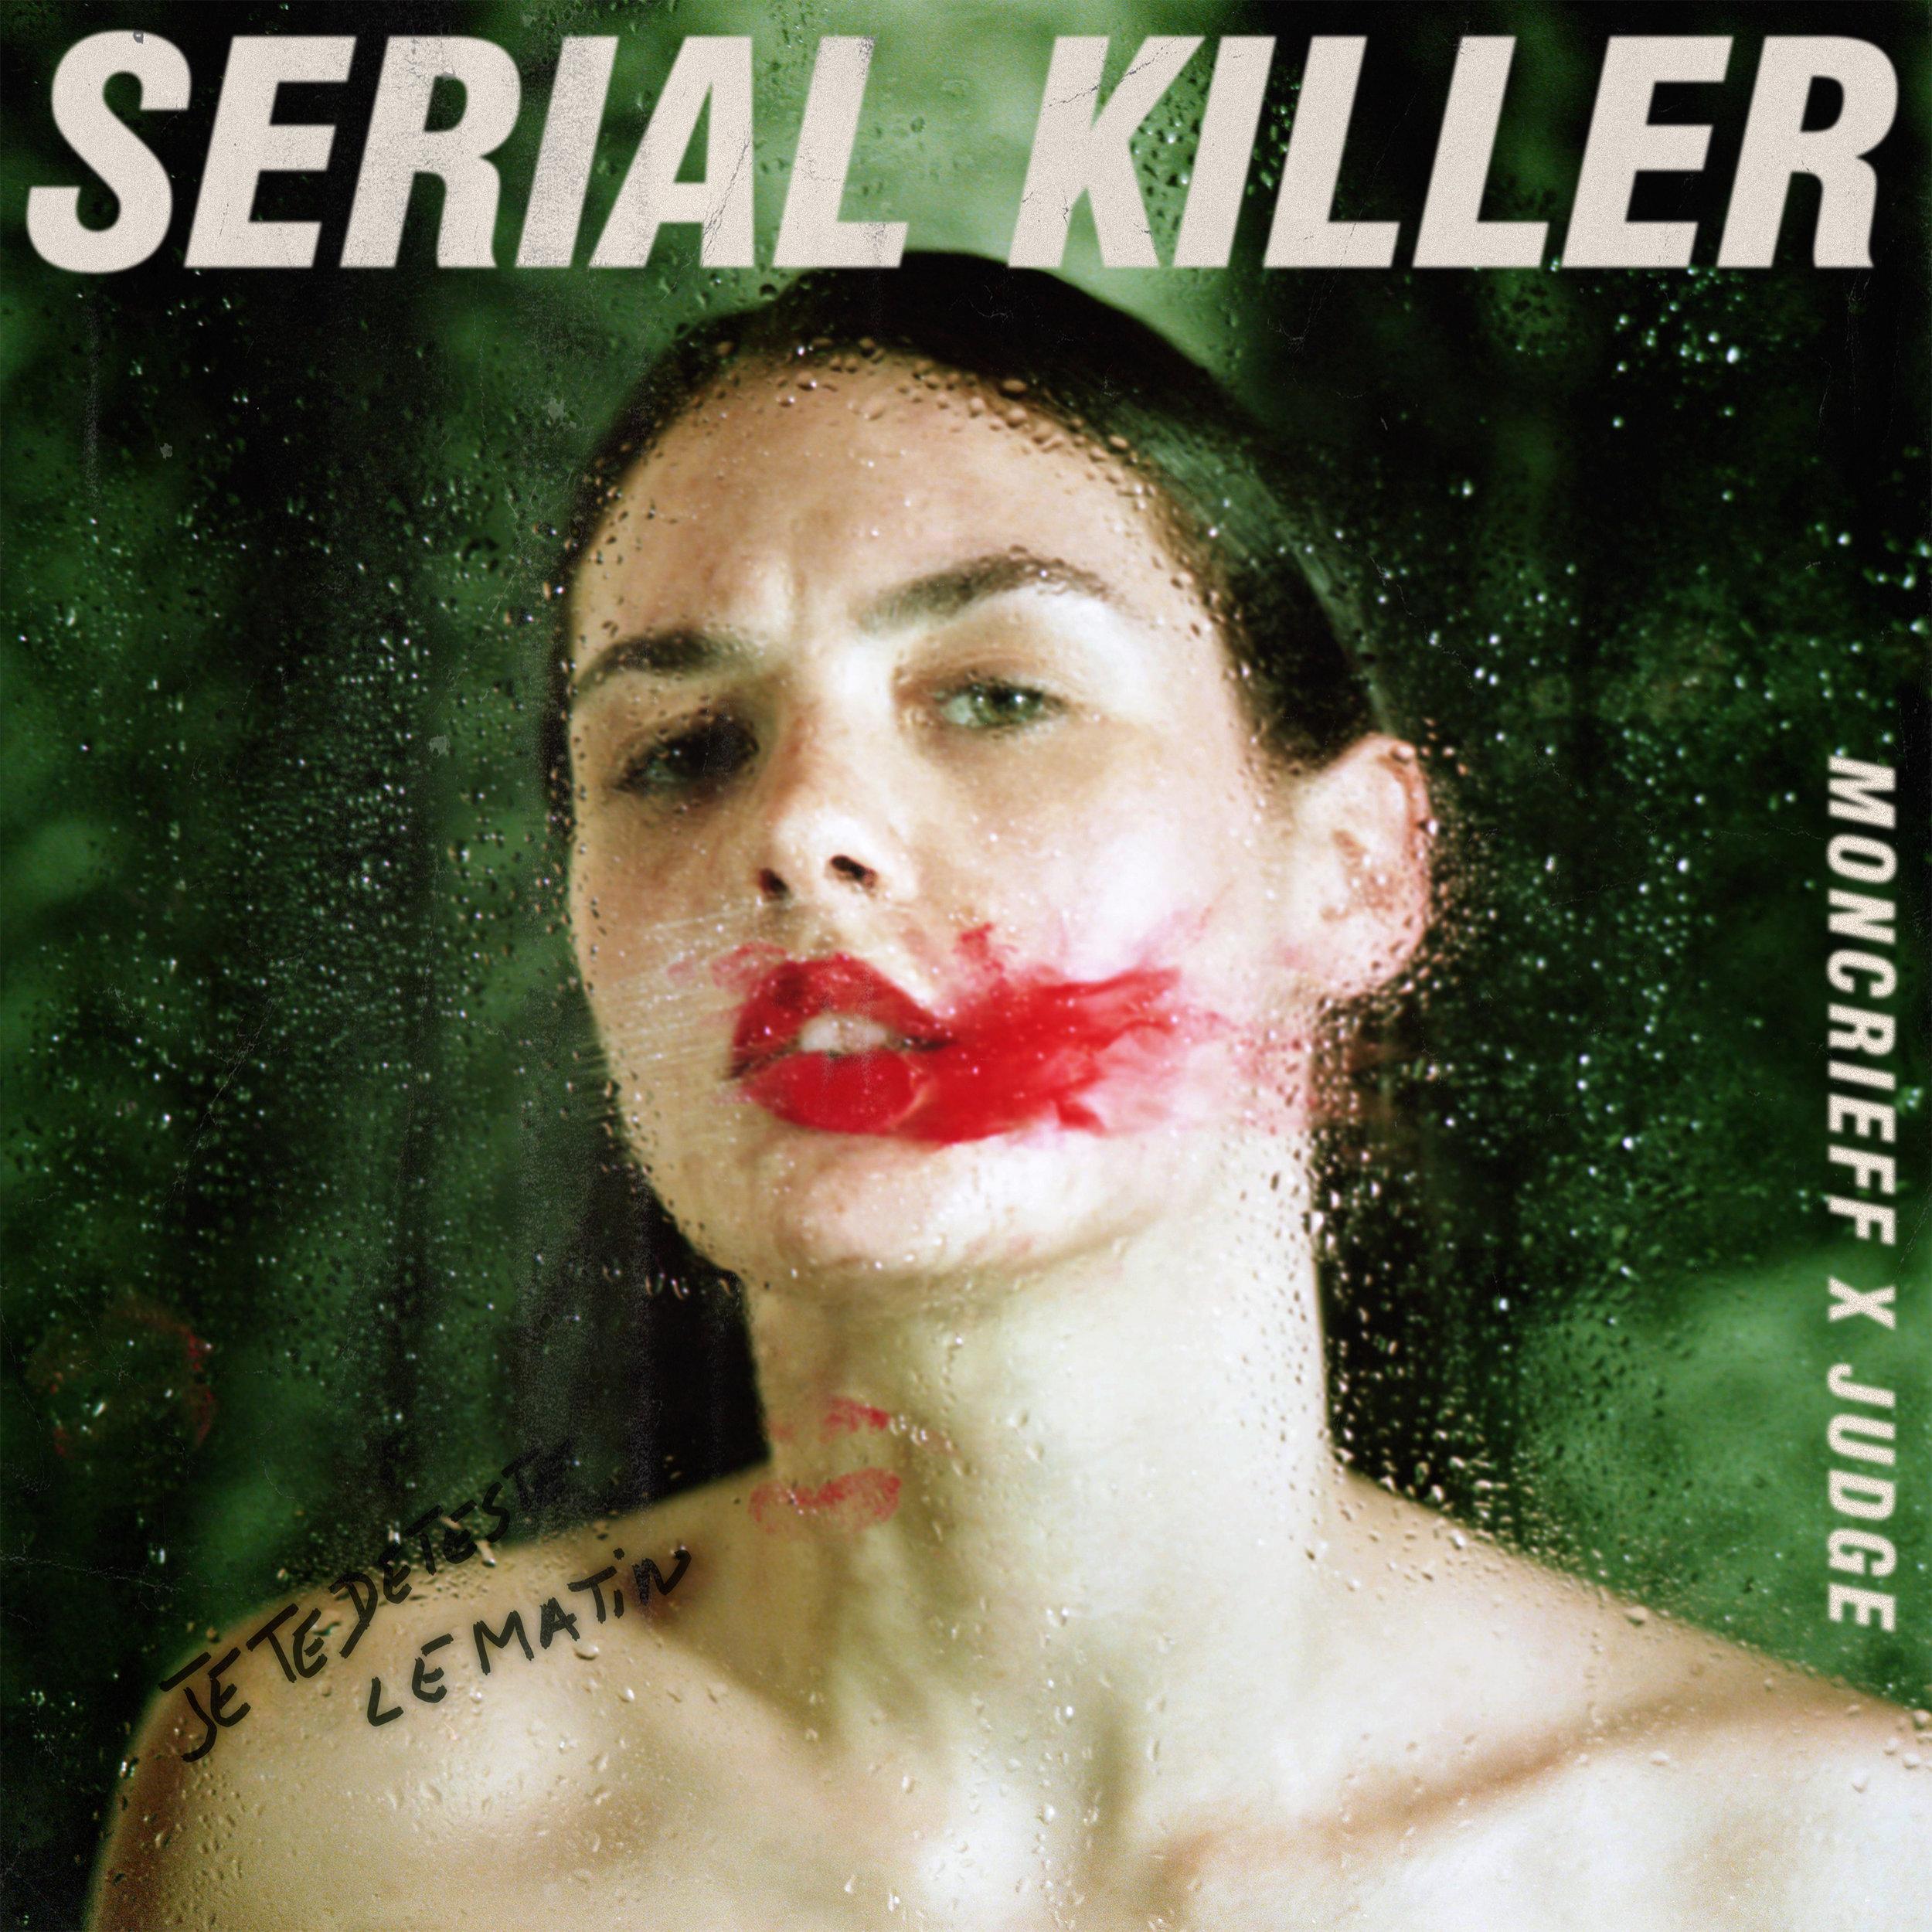 Moncrieff x JUDGE - Serial Killer